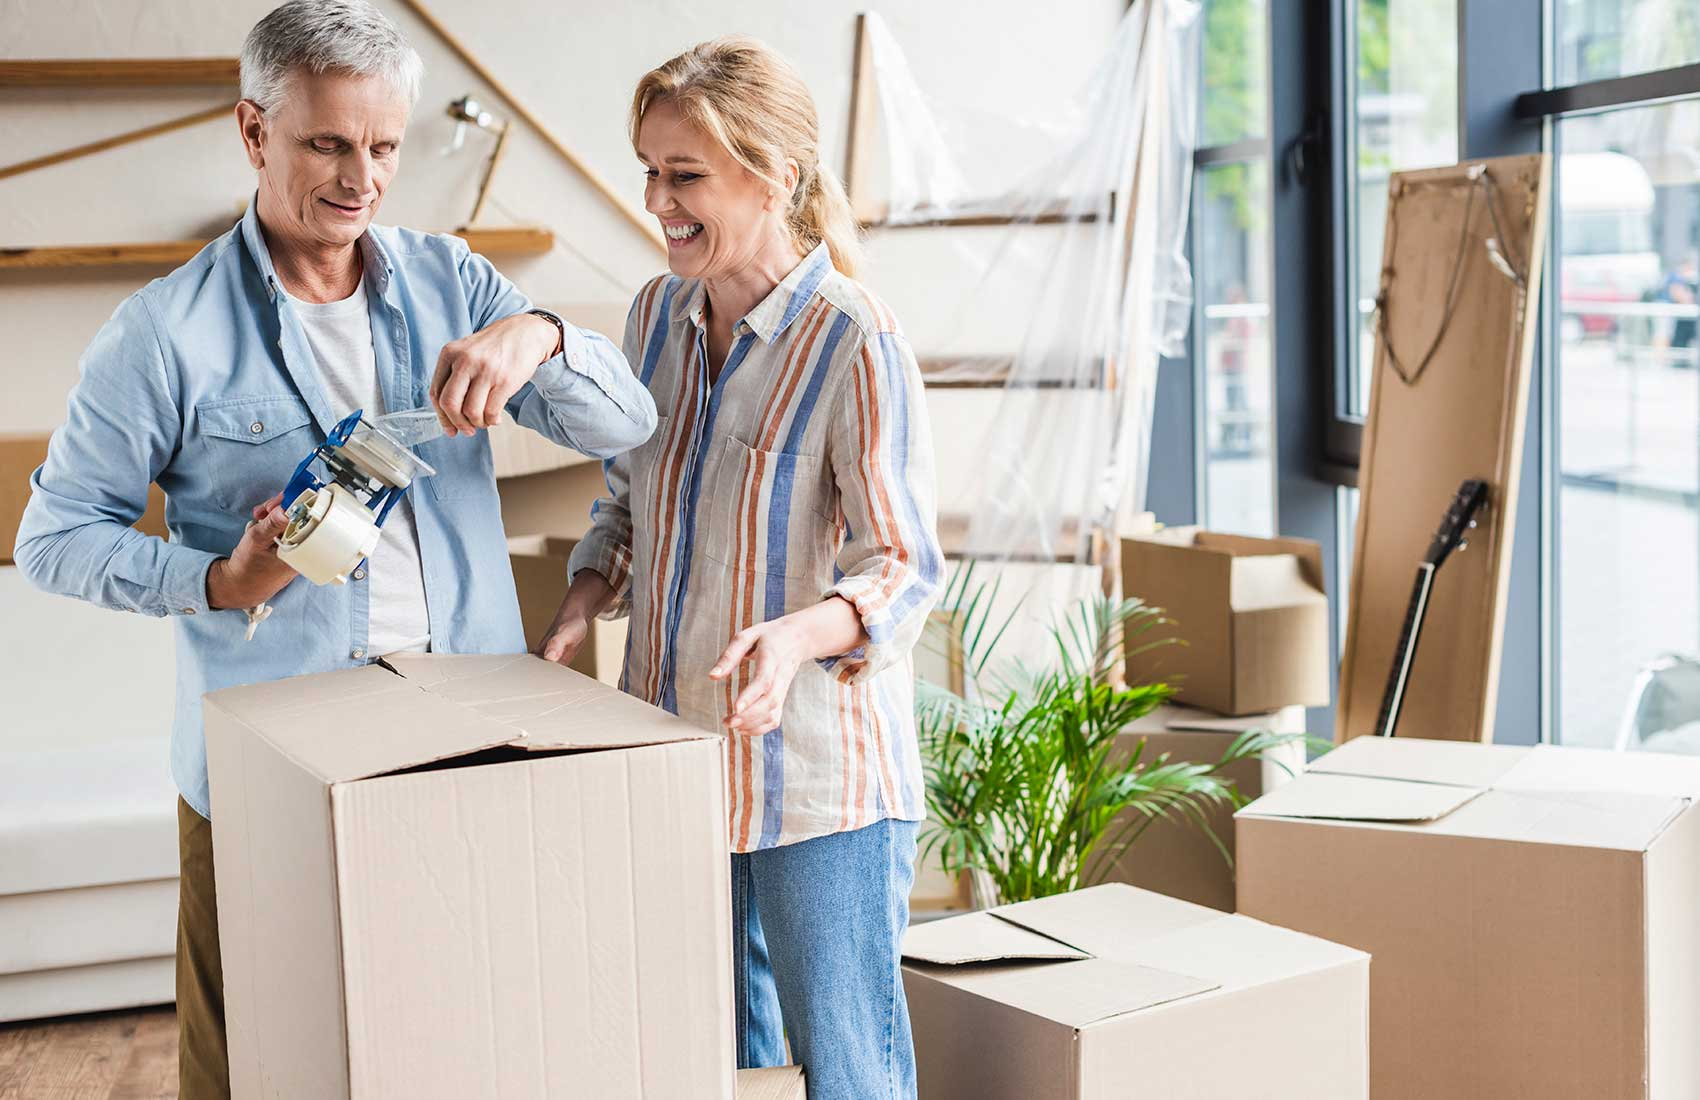 Senior-Moving-Service-Houston-Moving-by-Design